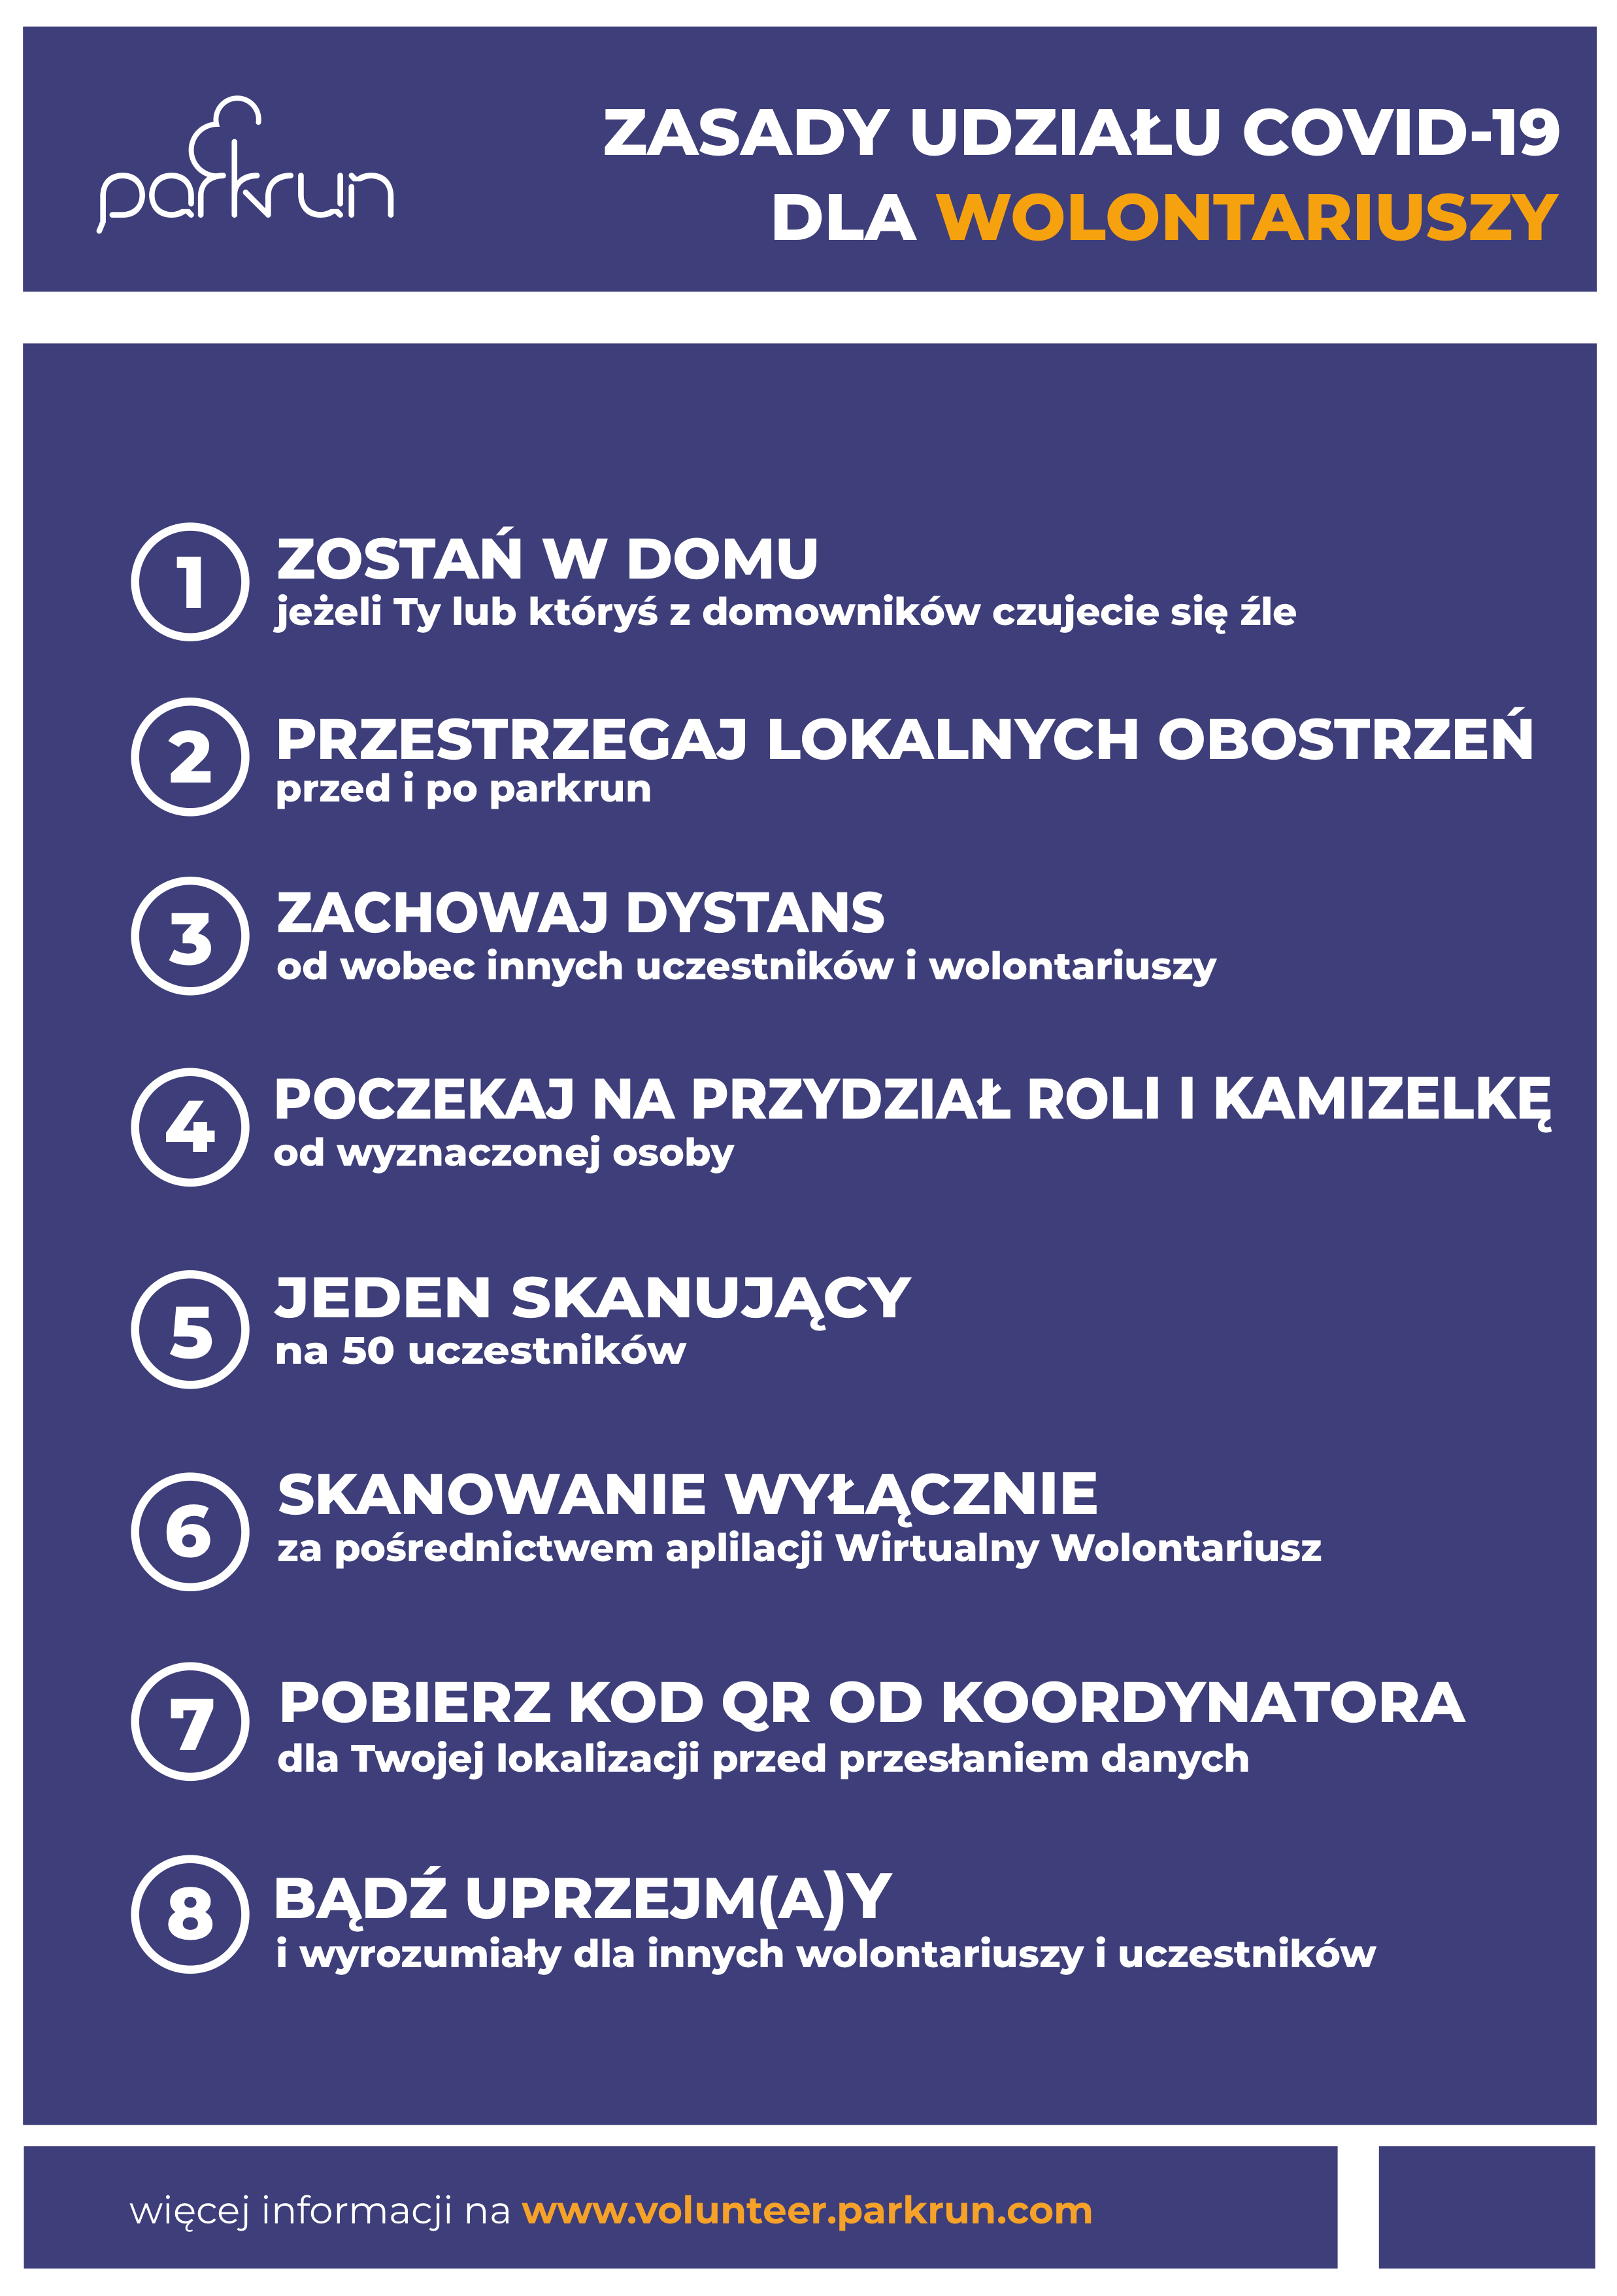 COVID19 parkrun code of conduct_PL wolontariusze